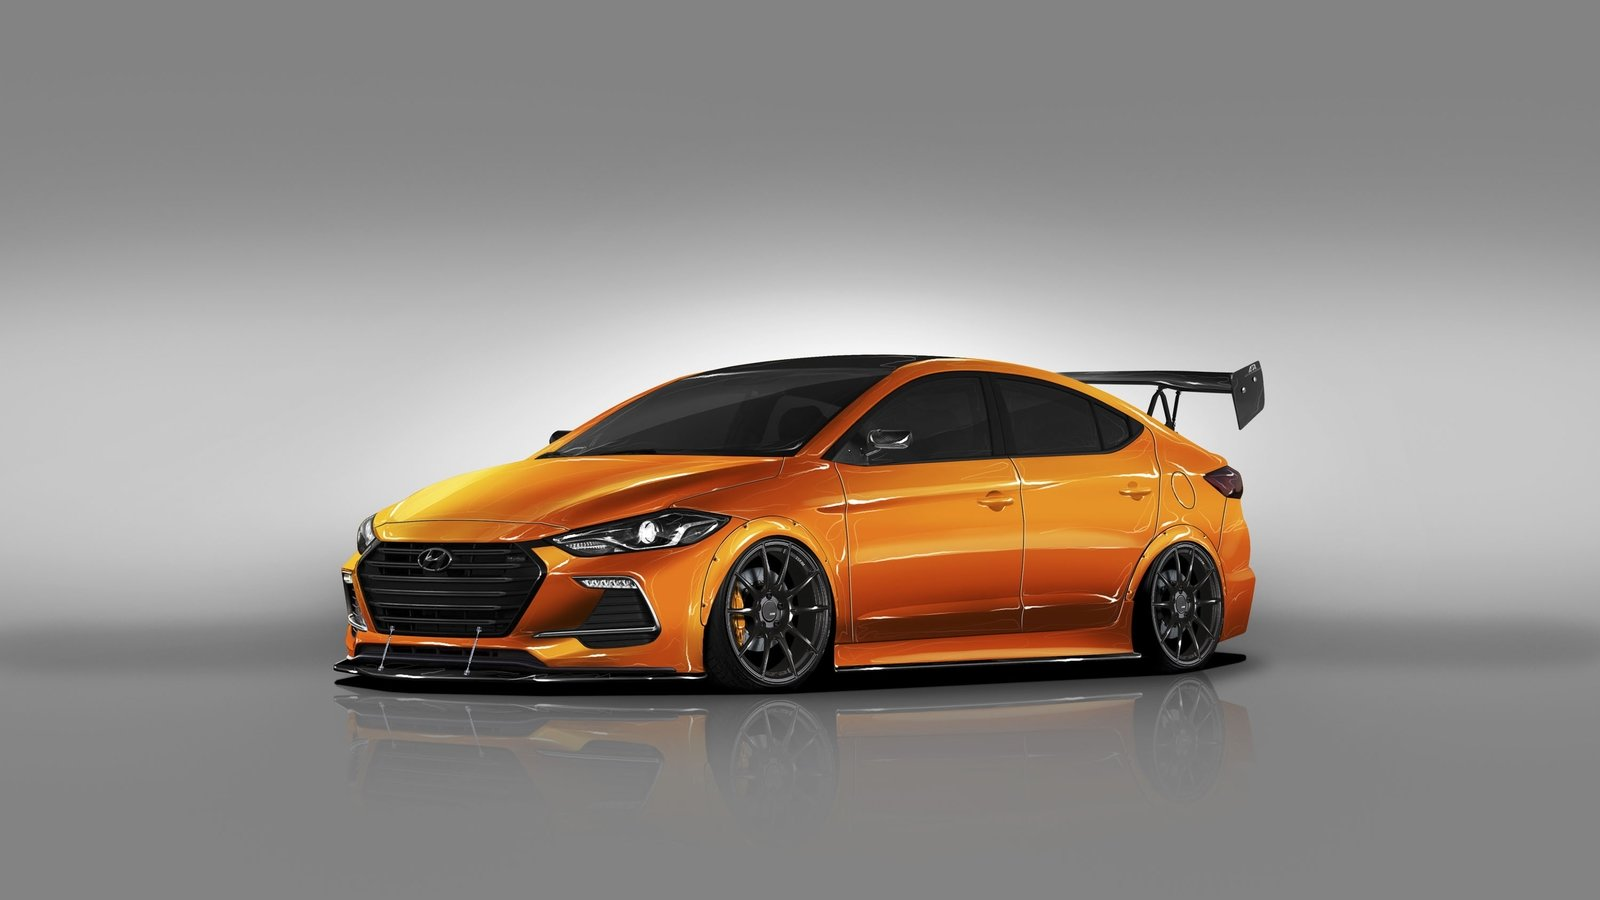 2017 Hyundai Btr Edition Elantra Sport Concept Pictures